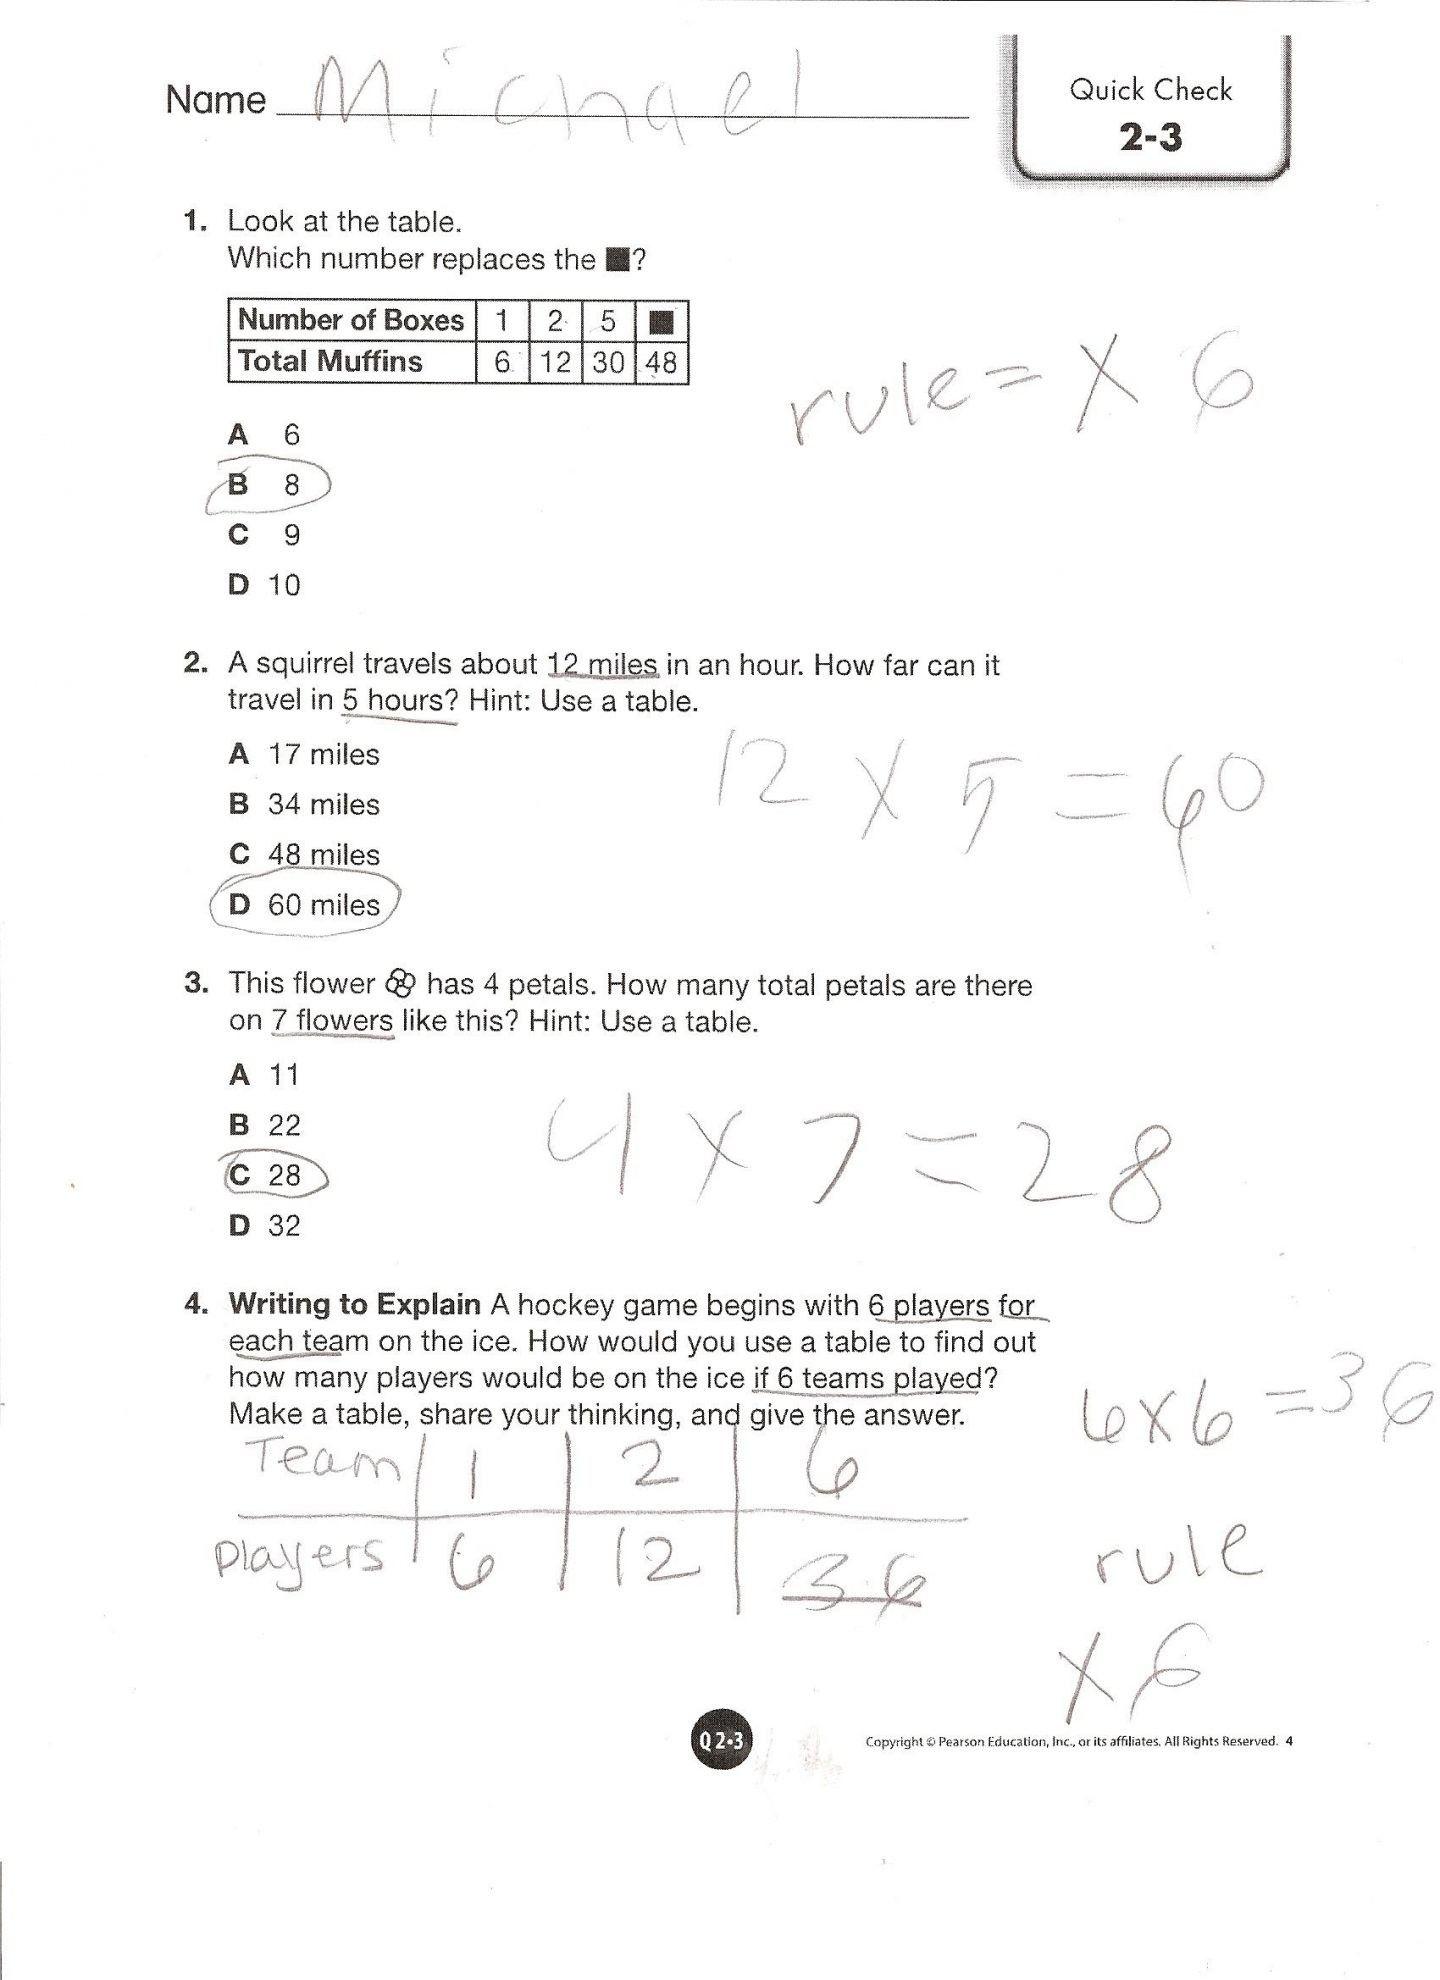 10 Best Of Pizzazz Math Worksheets- Pizzazz Math Worksheets . 10 Best Of  Pizzazz Math Worksheets . Jittersthe Clown S Content Nerd Fitness Rebellion  - #pizzaz… di 2020 [ 1980 x 1440 Pixel ]